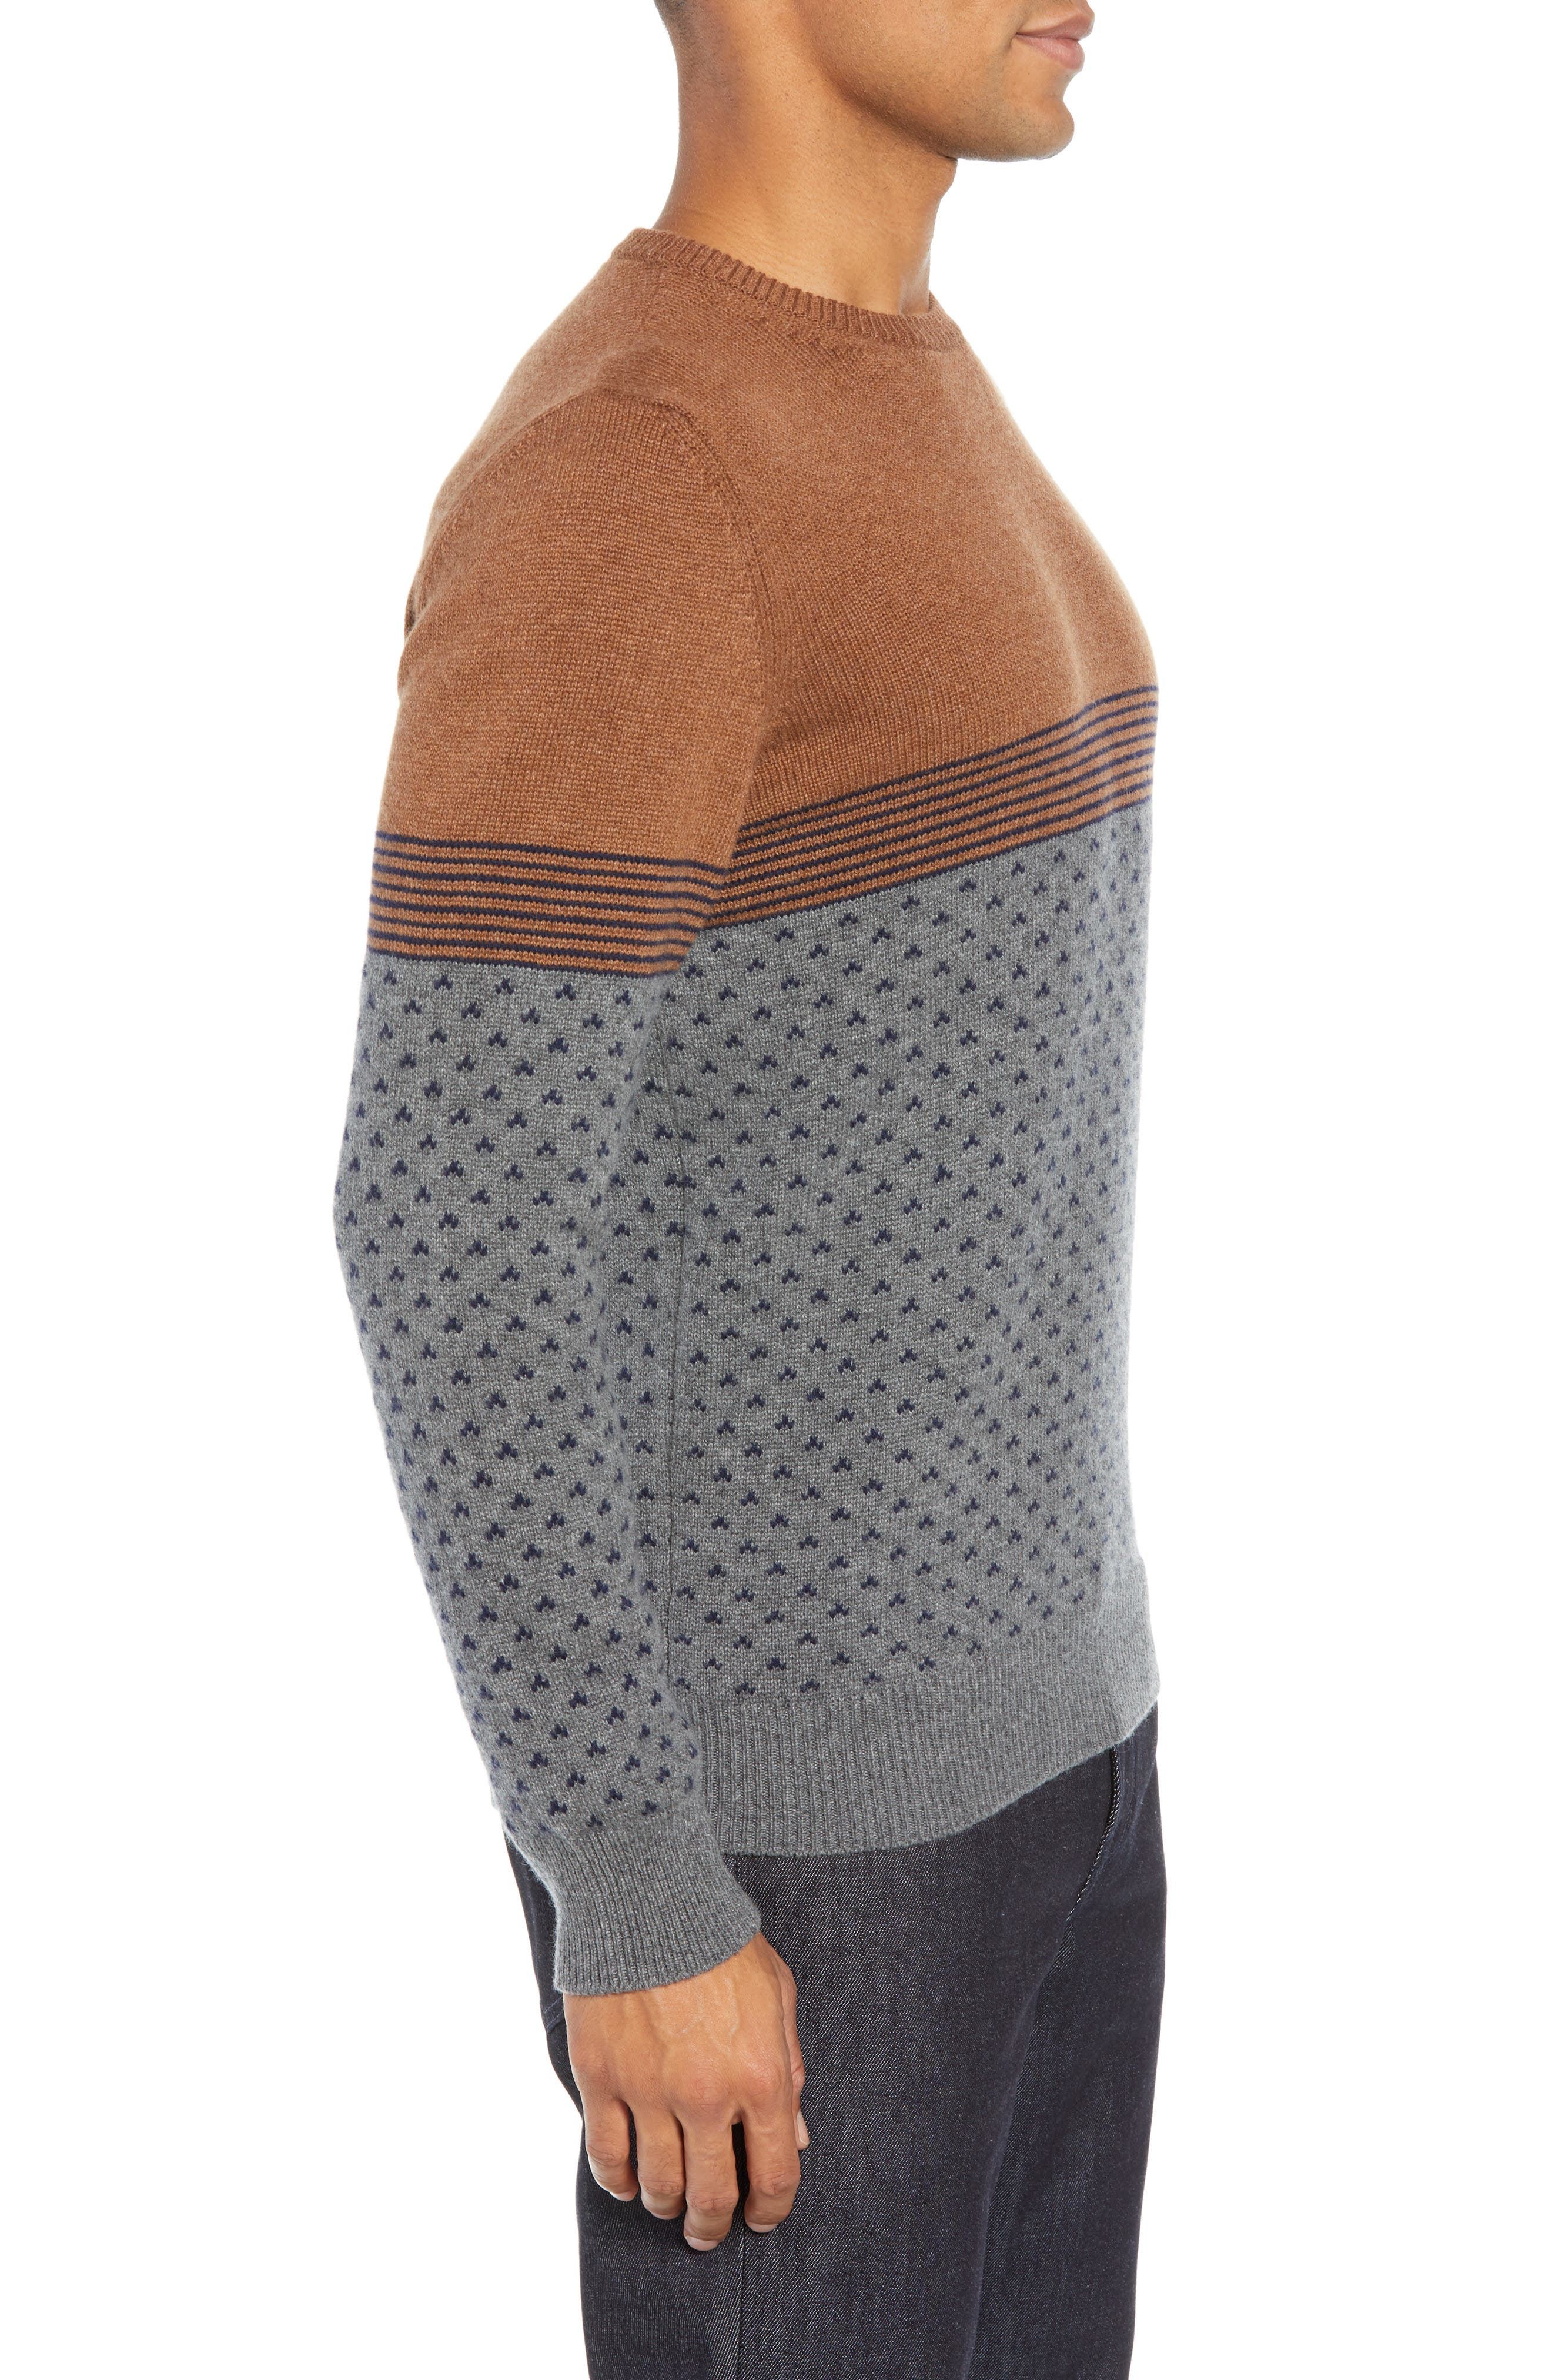 Trim Fit Cashmere Sweater,                             Alternate thumbnail 3, color,                             GREY